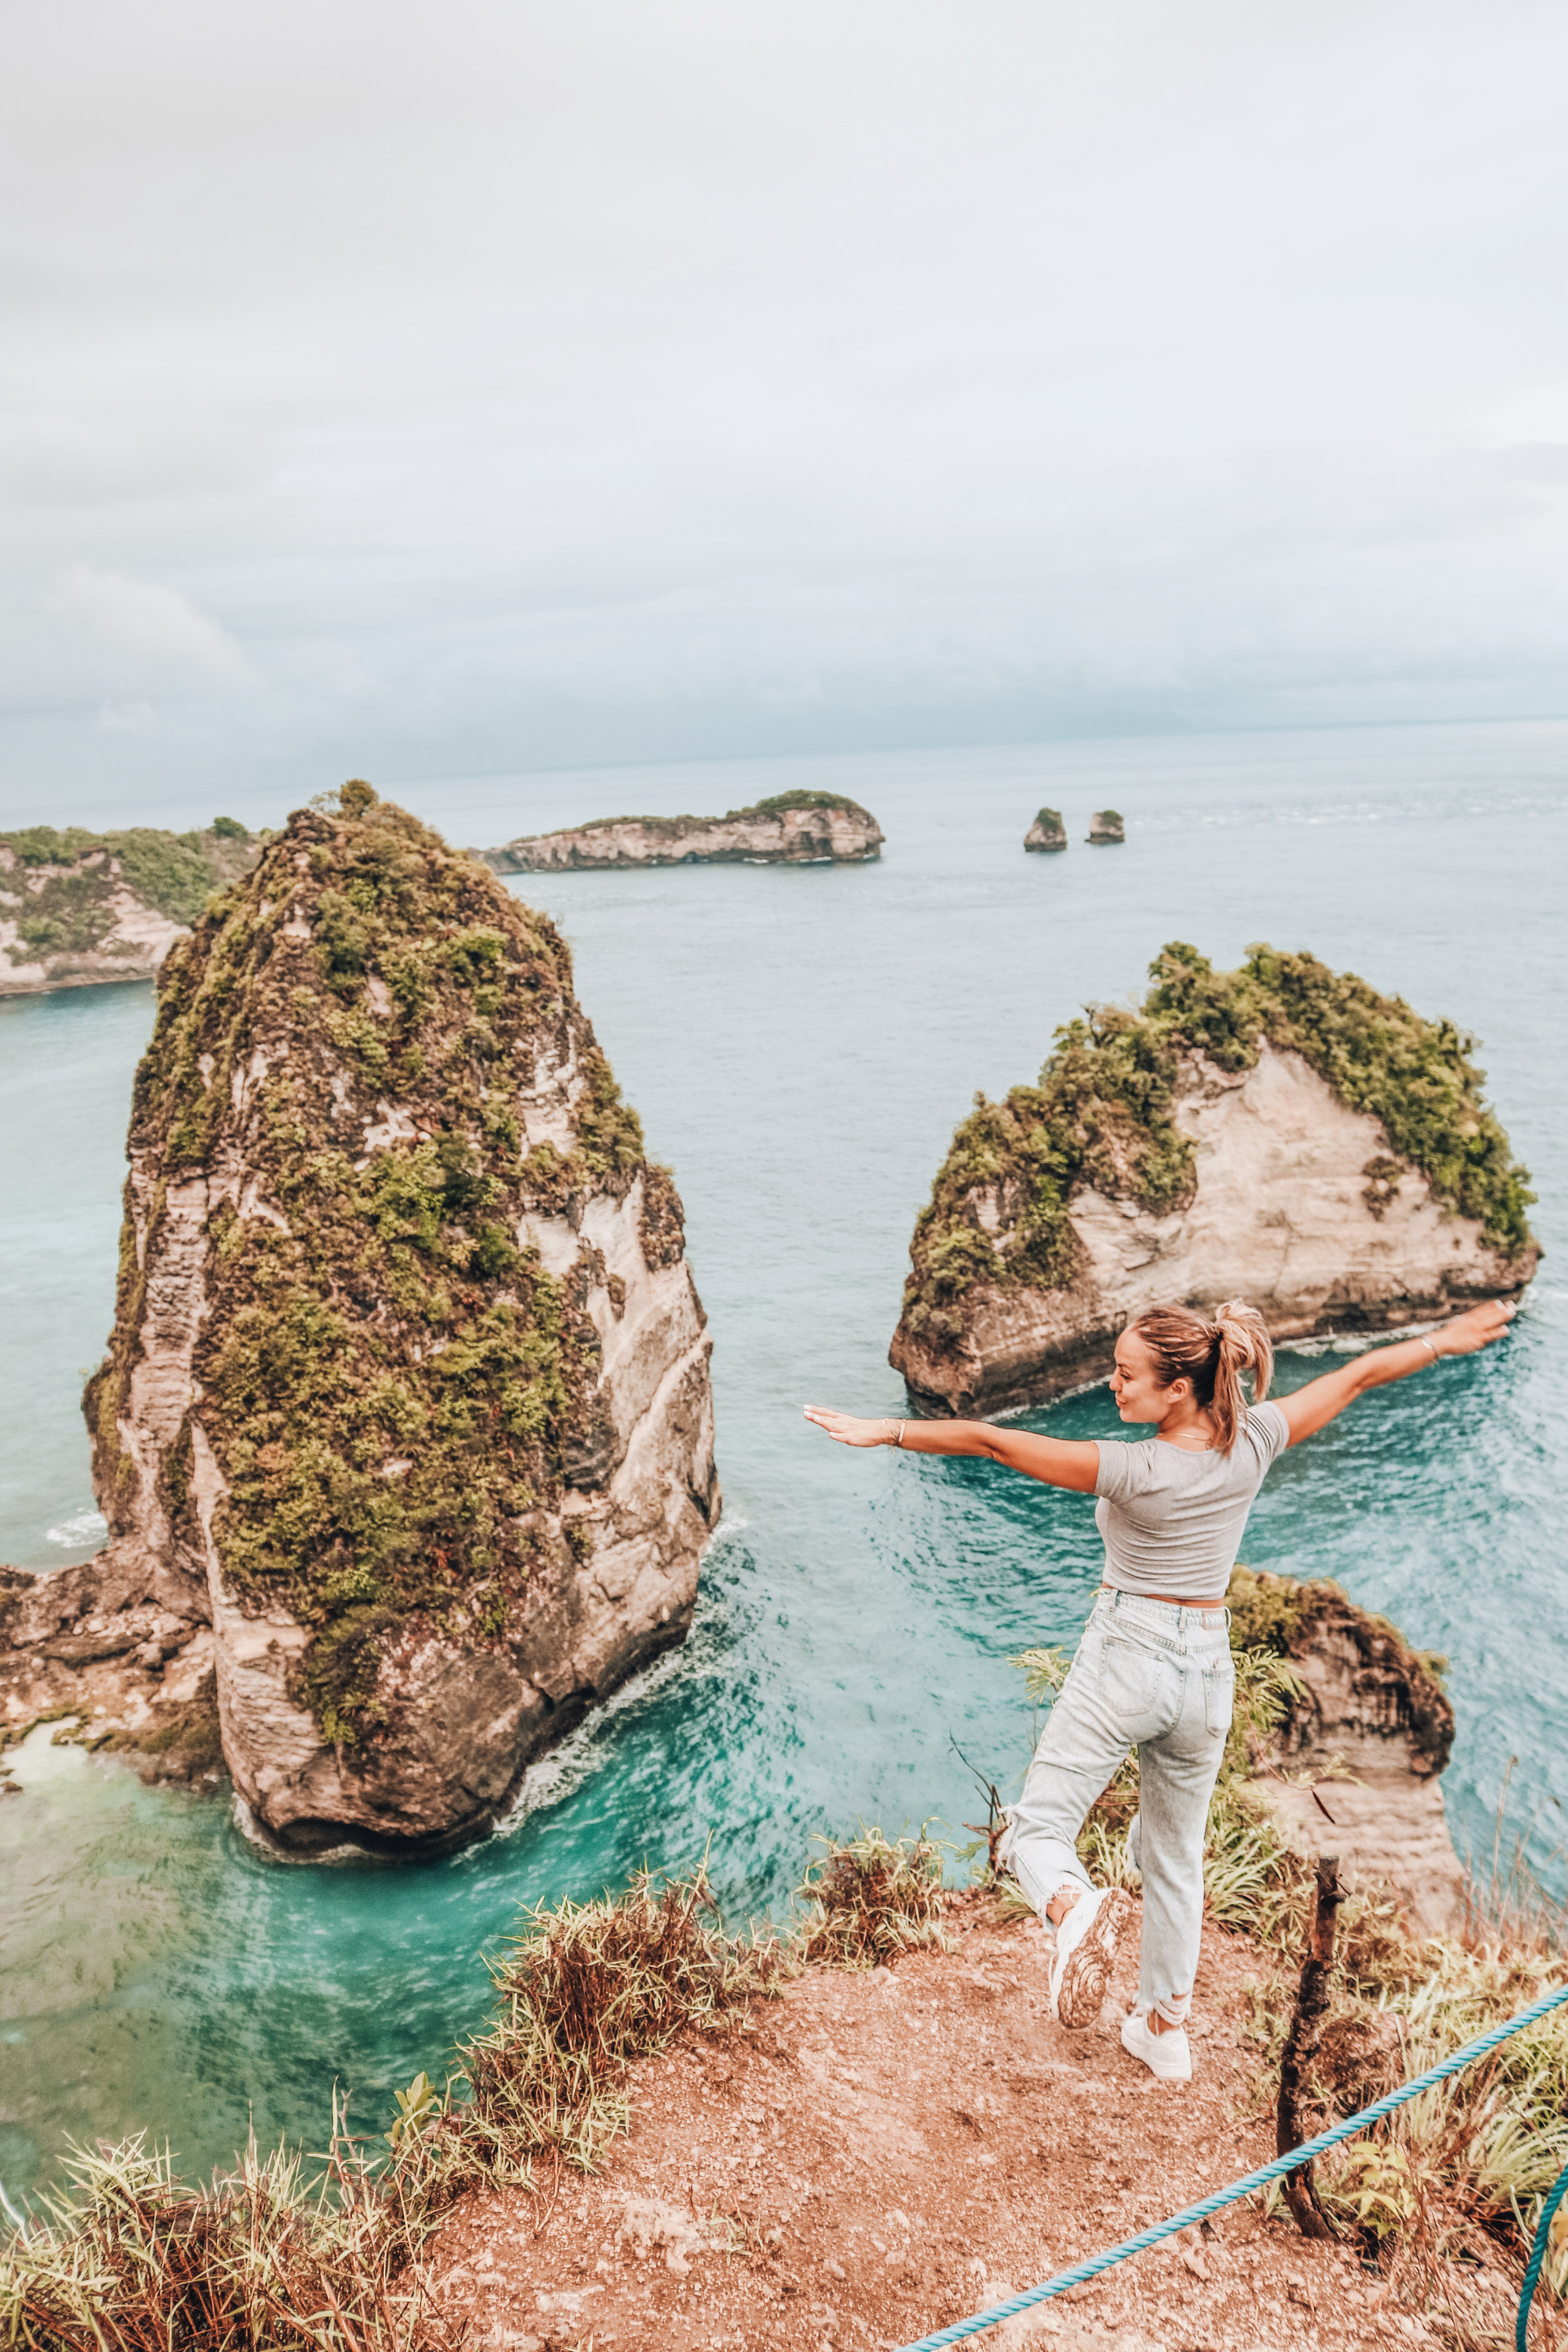 thousand-islands-view-point-nusa-penida.jpg